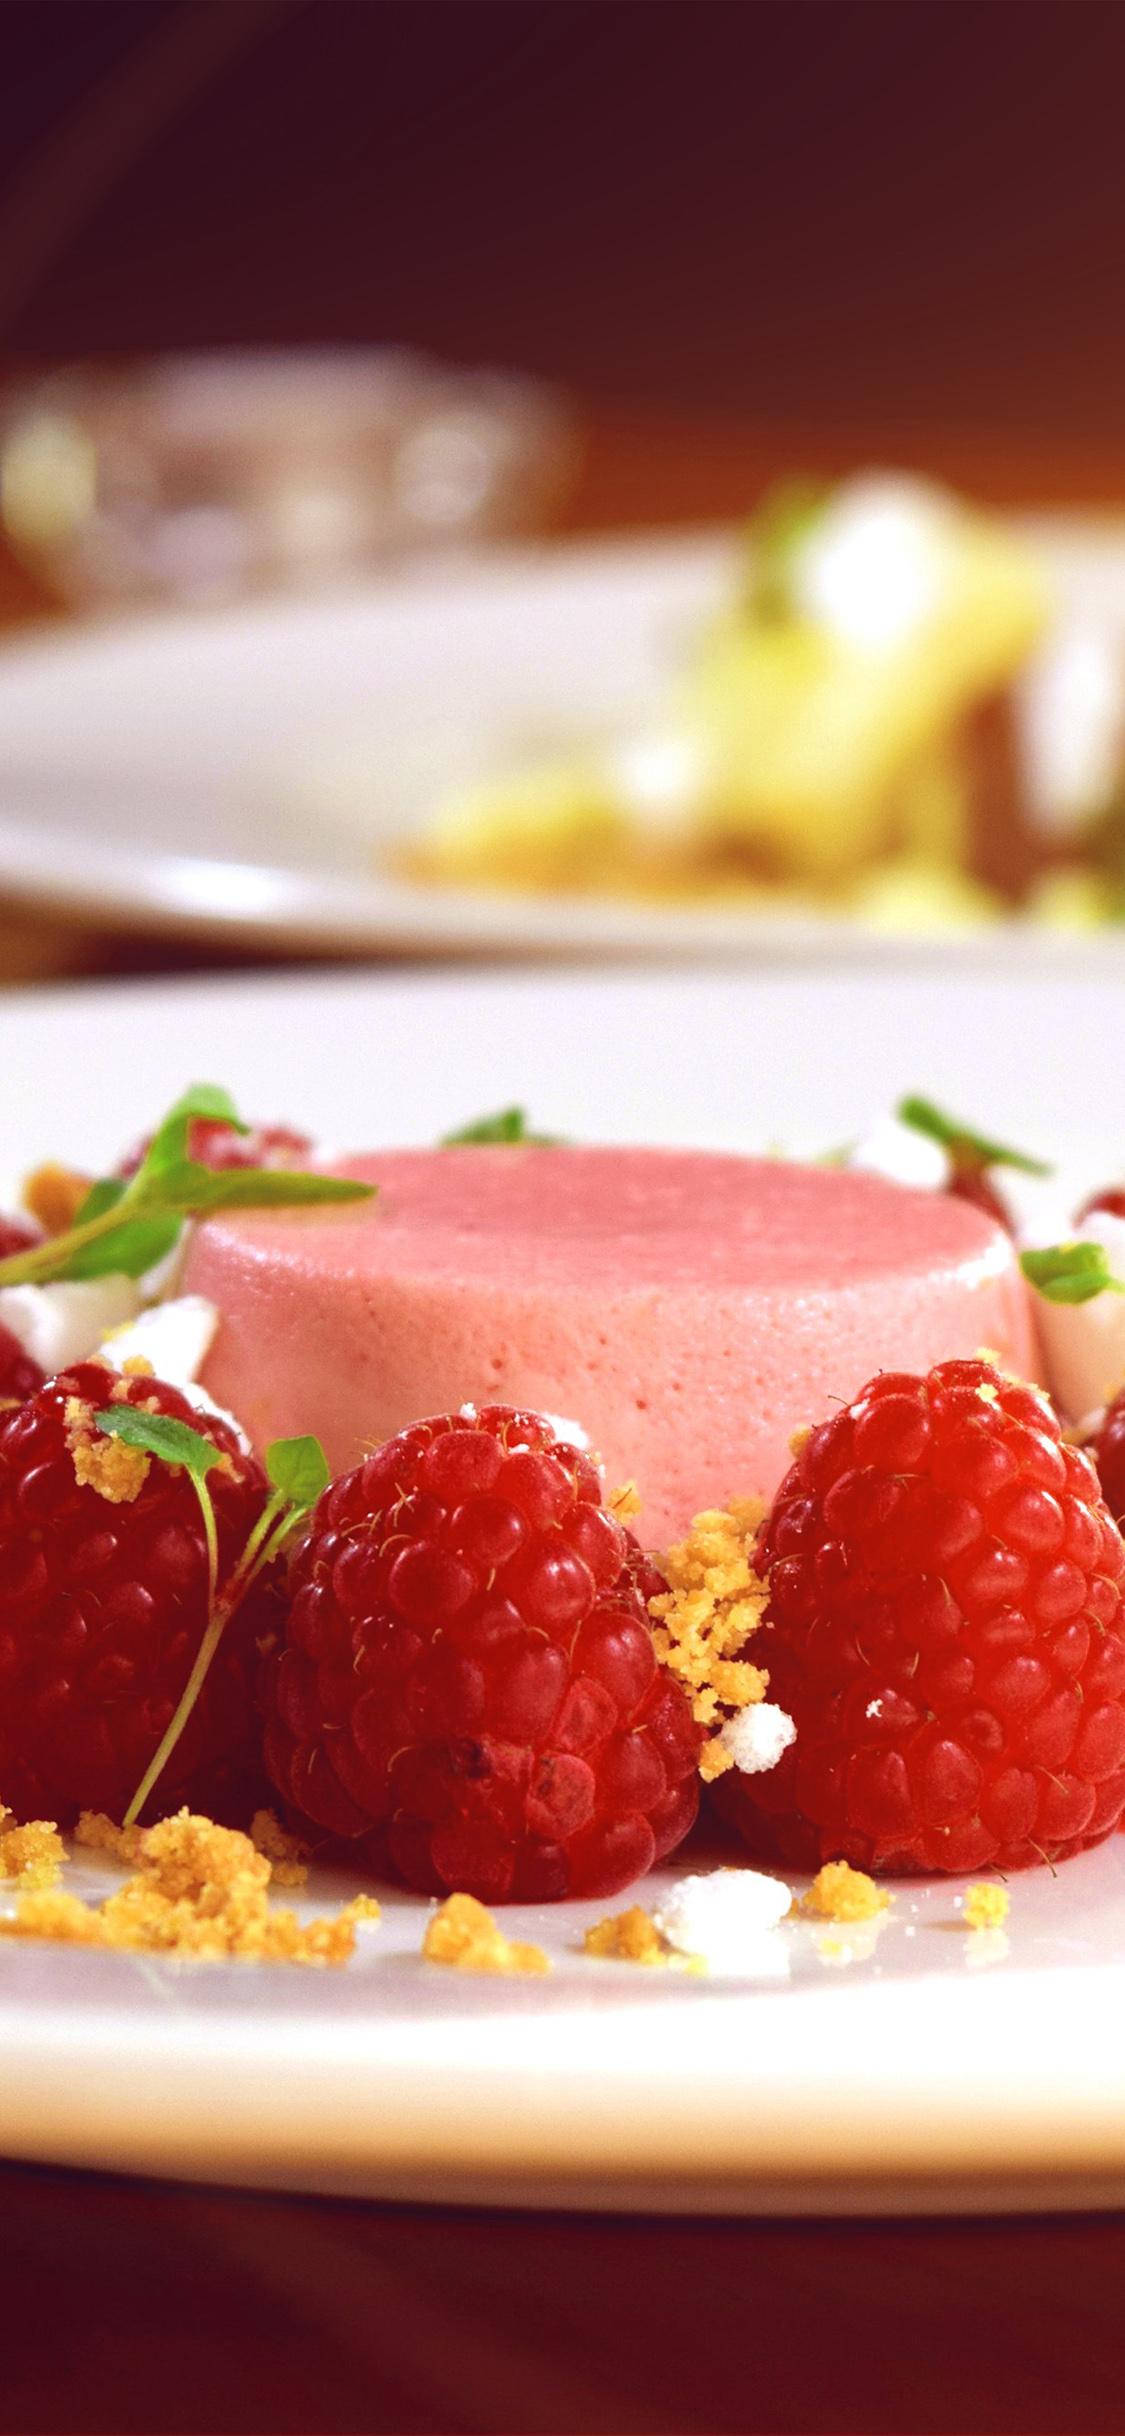 iPhoneXpapers.com-Apple-iPhone-wallpaper-nb57-food-stylist-dessert-berry-cake-bokeh-flare